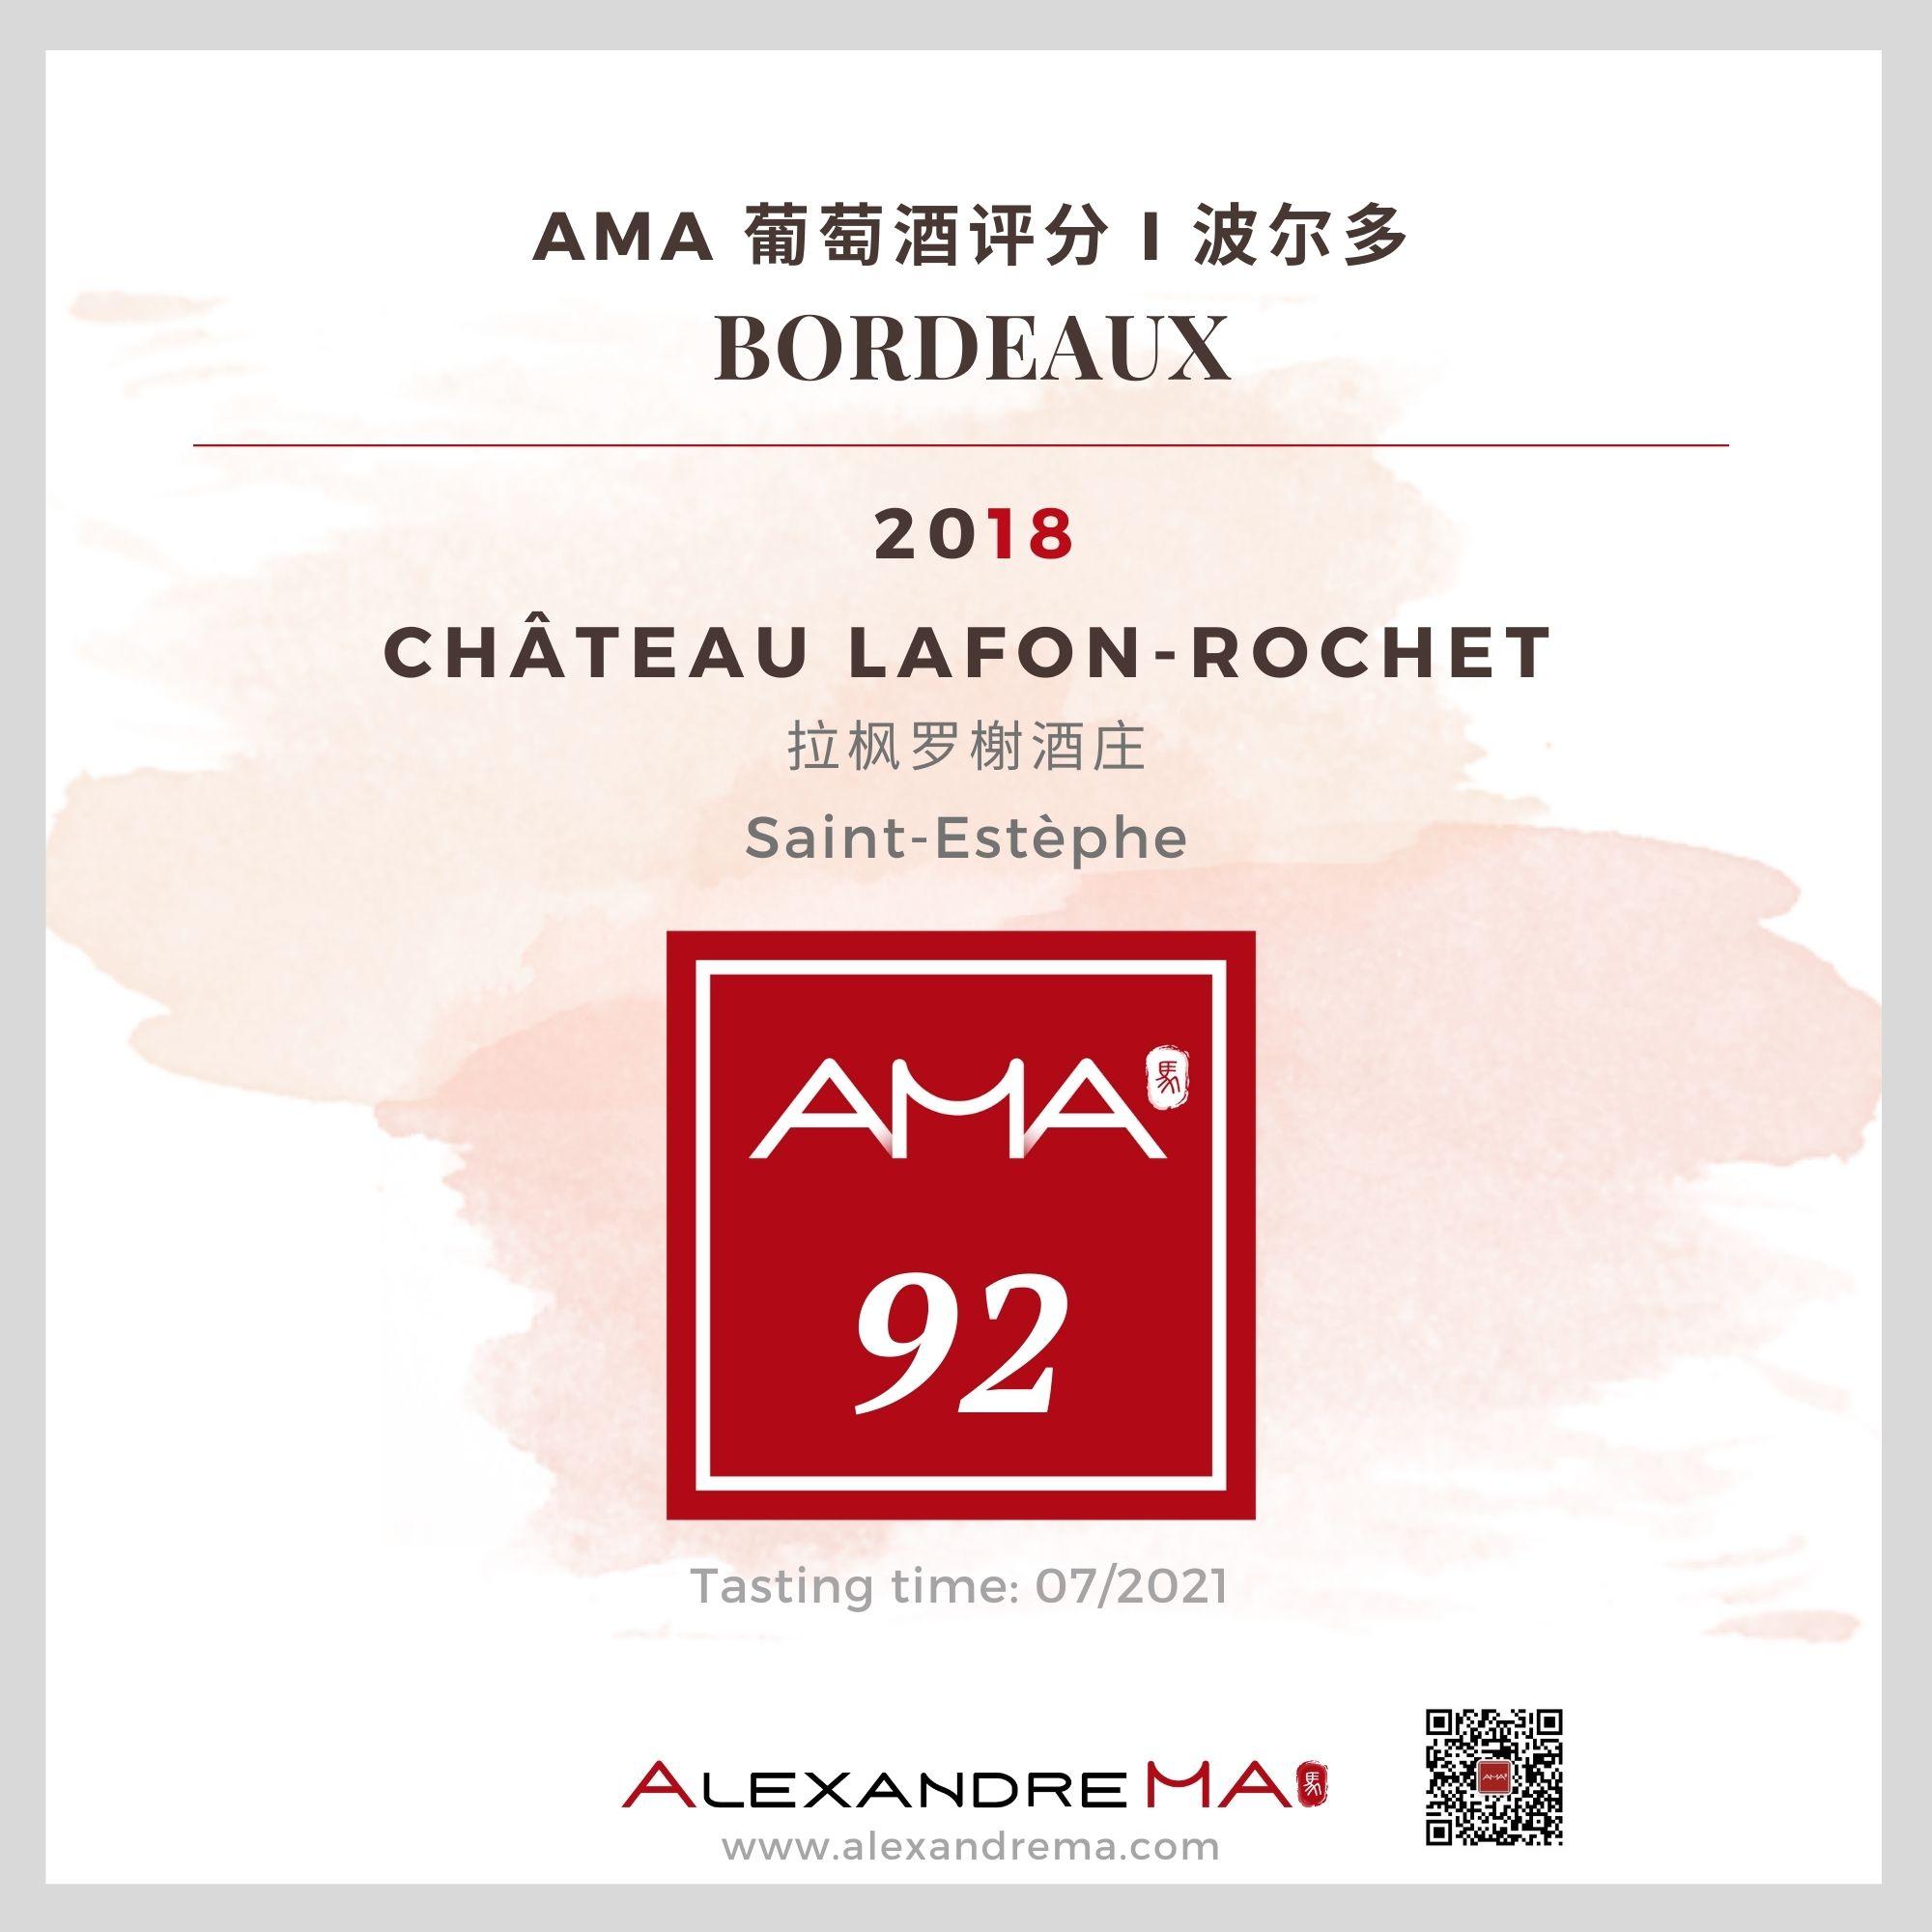 Château Lafon-Rochet 2018 拉风罗榭酒庄 - Alexandre Ma